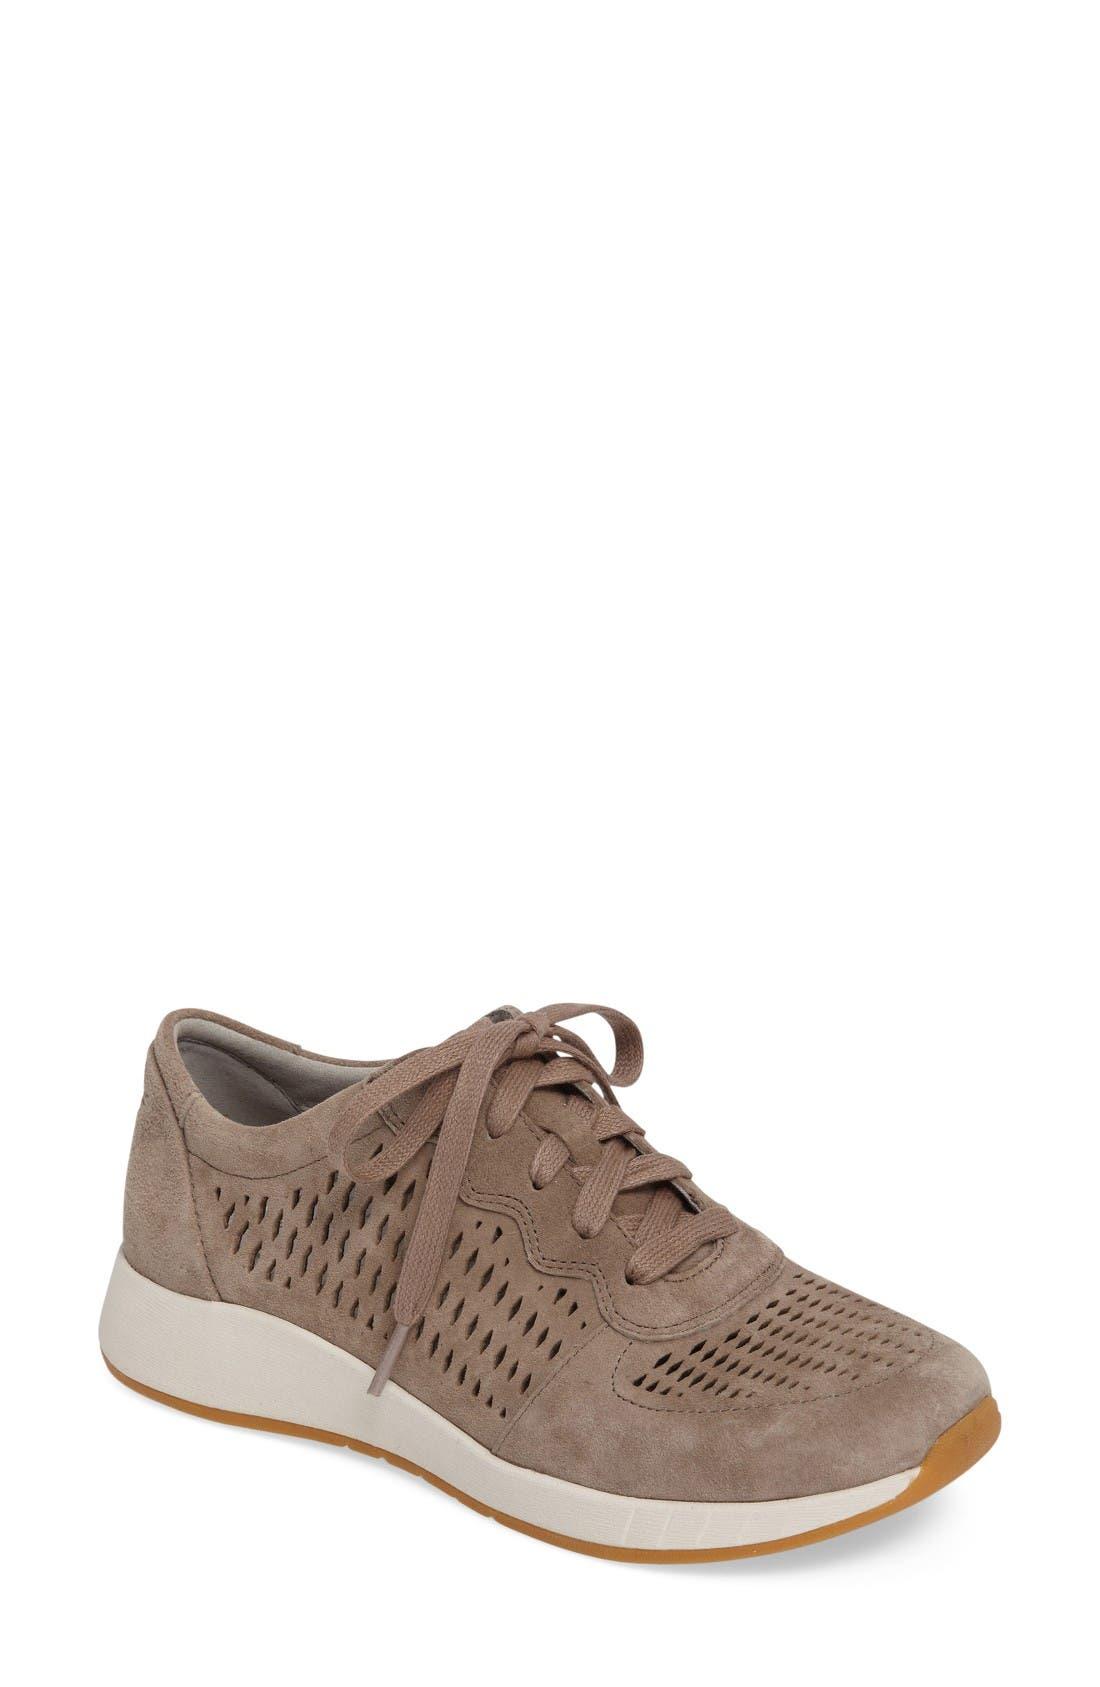 Alternate Image 1 Selected - Dansko Charlie Perforated Sneaker (Women)